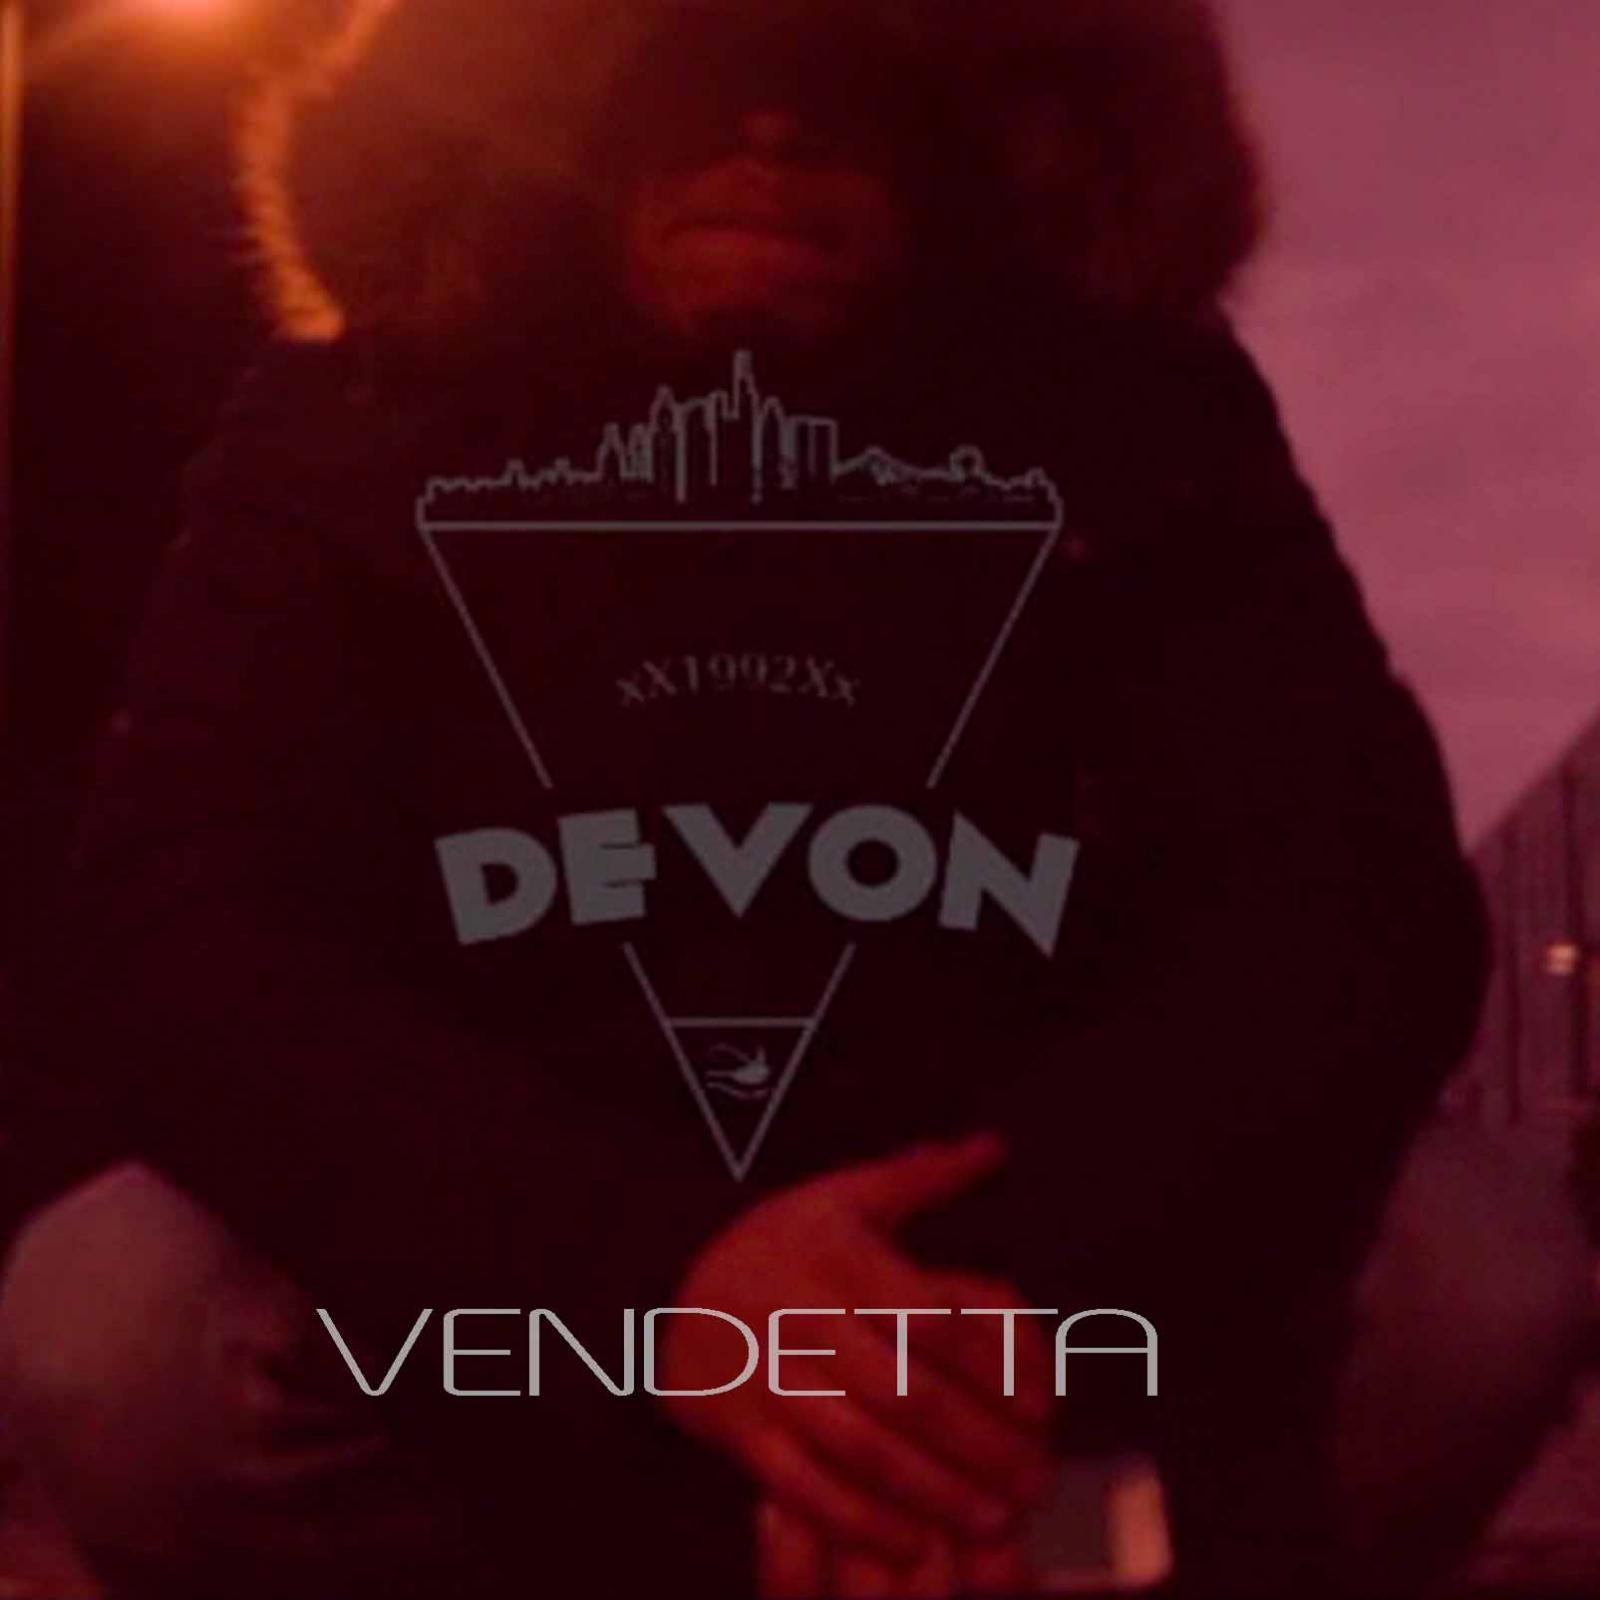 Upcoming: Devon - Vendetta